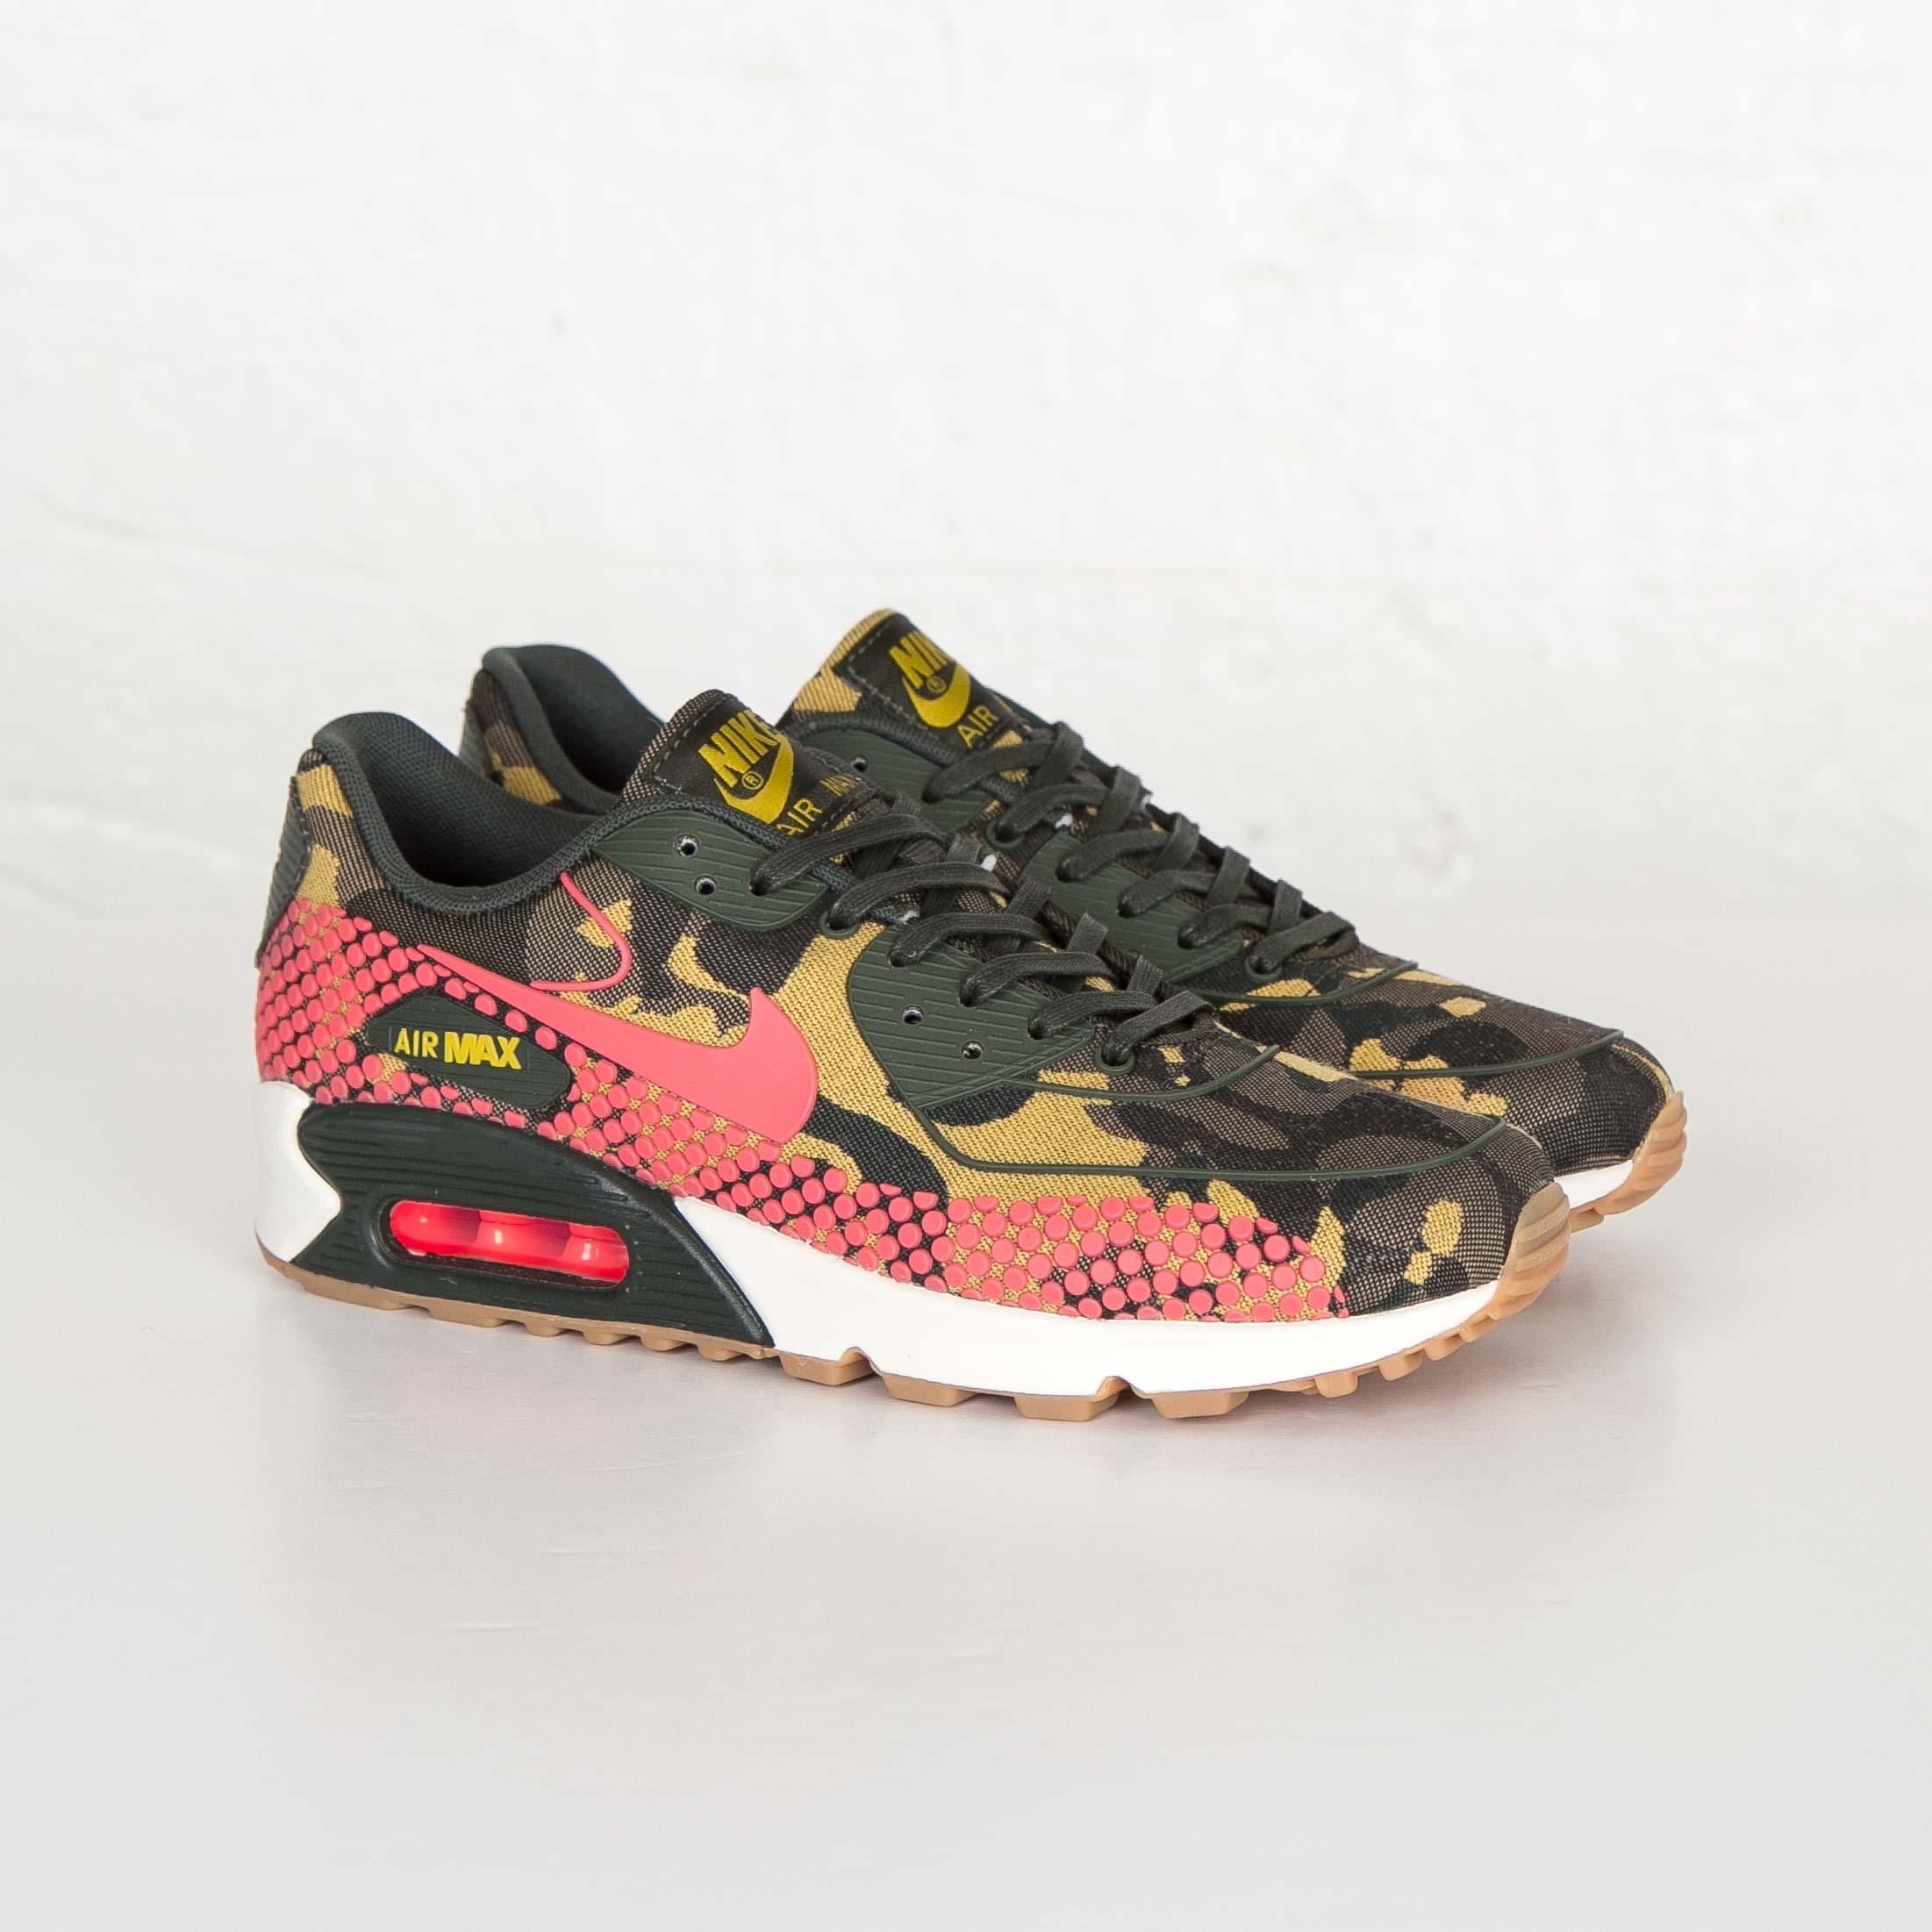 276d1dc5010b Nike W Air Max 90 Jacquard Premium - 807298-200 - Sneakersnstuff ...